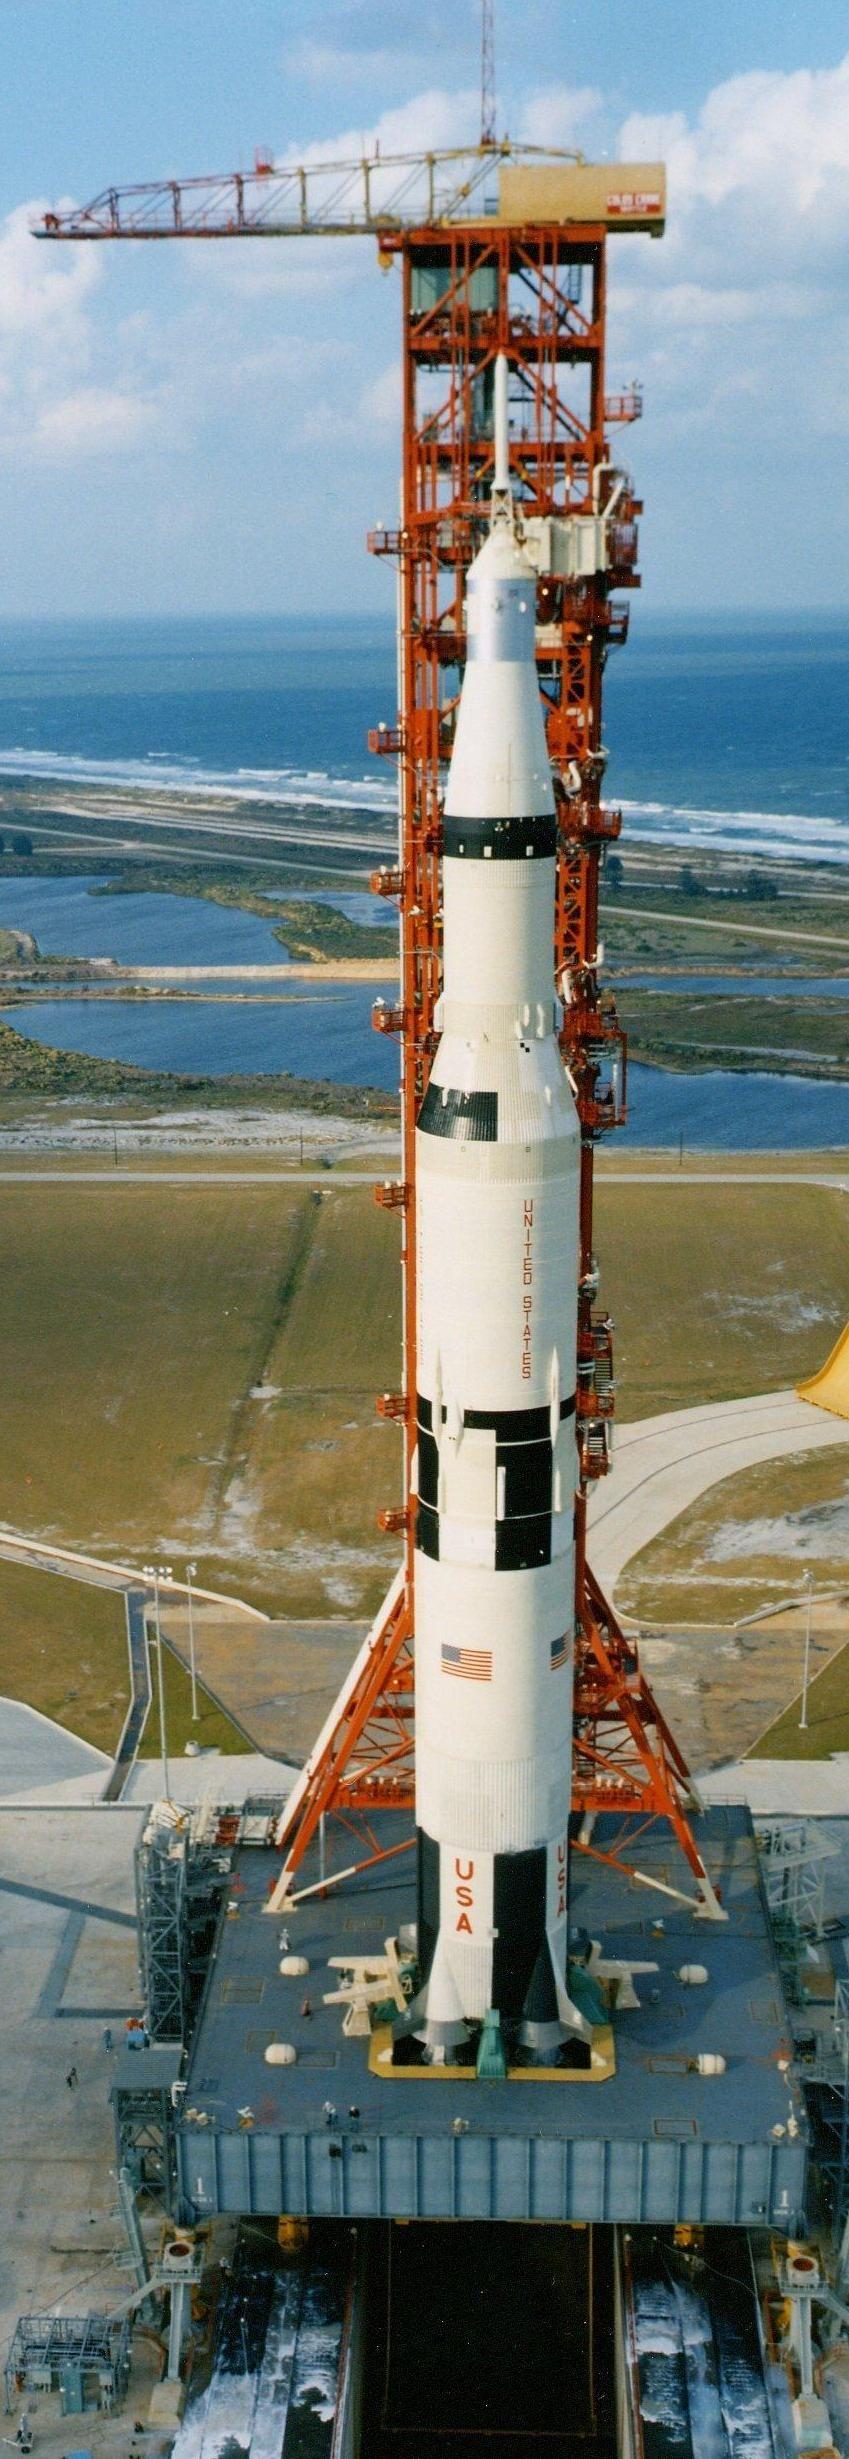 apollo space program nasa - photo #49